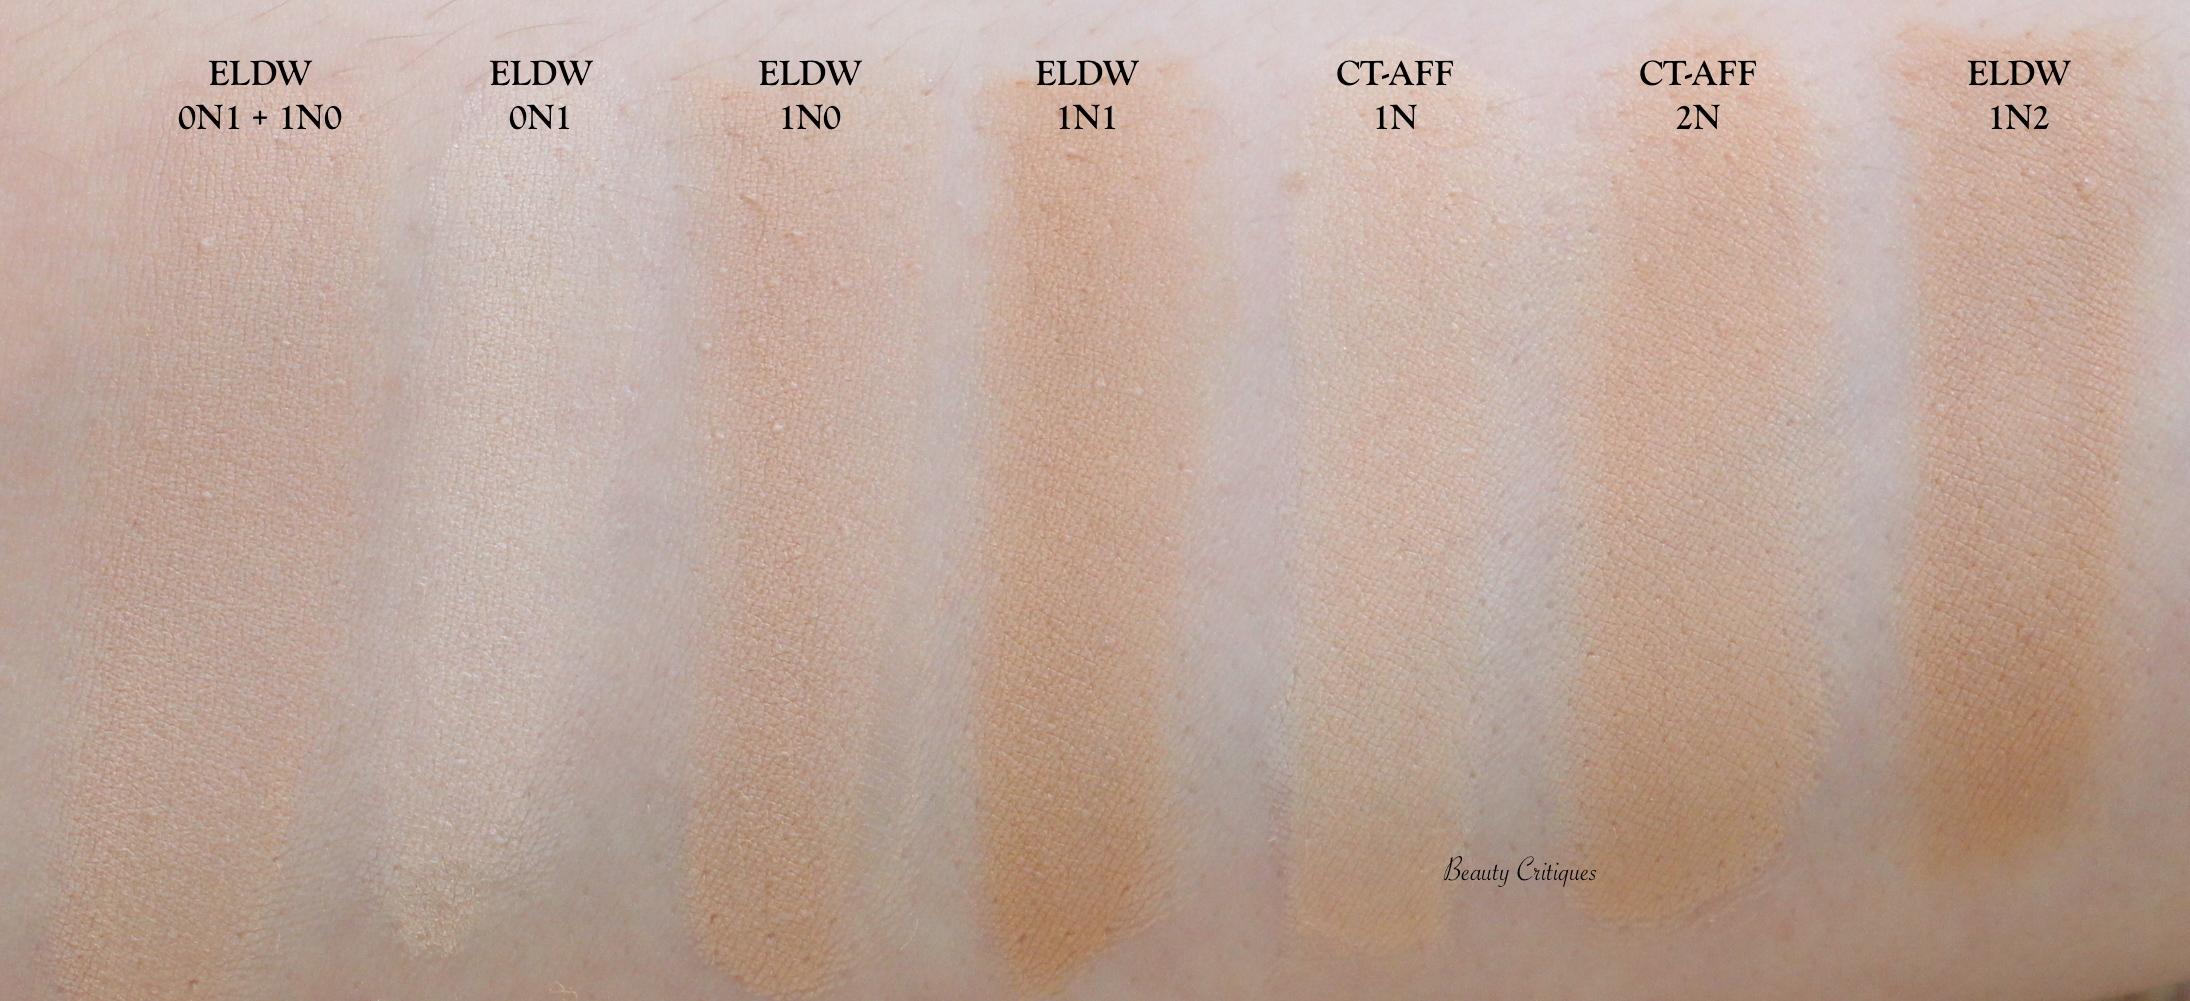 Magic Vanish Color Corrector by Charlotte Tilbury #11